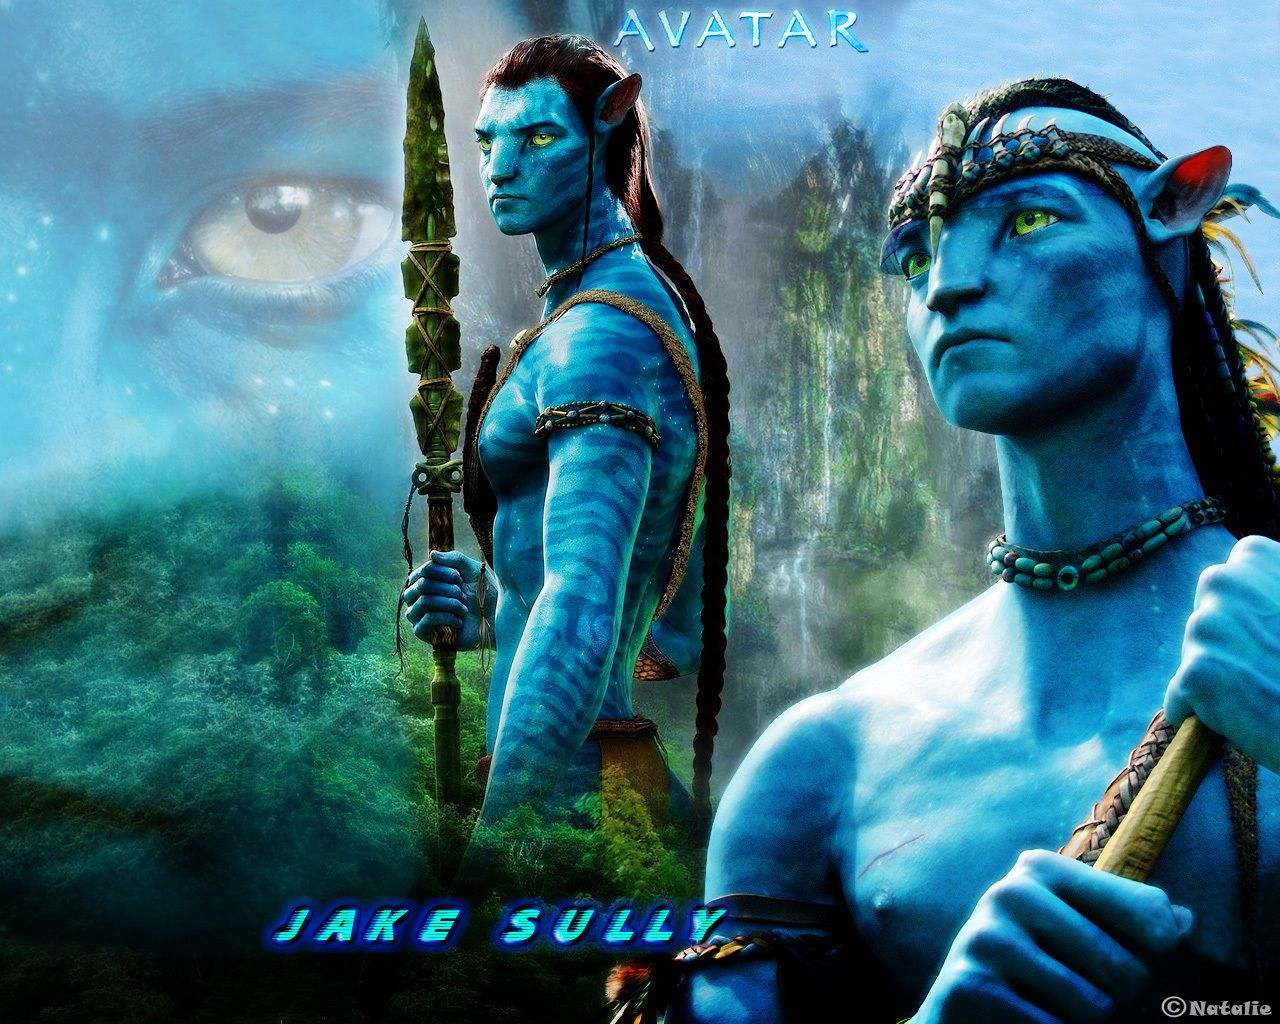 Must see Wallpaper Movie Avatar 2 - 02d0f9b0f6227e2112e67c6bf4db54d5  Image_646688.jpg